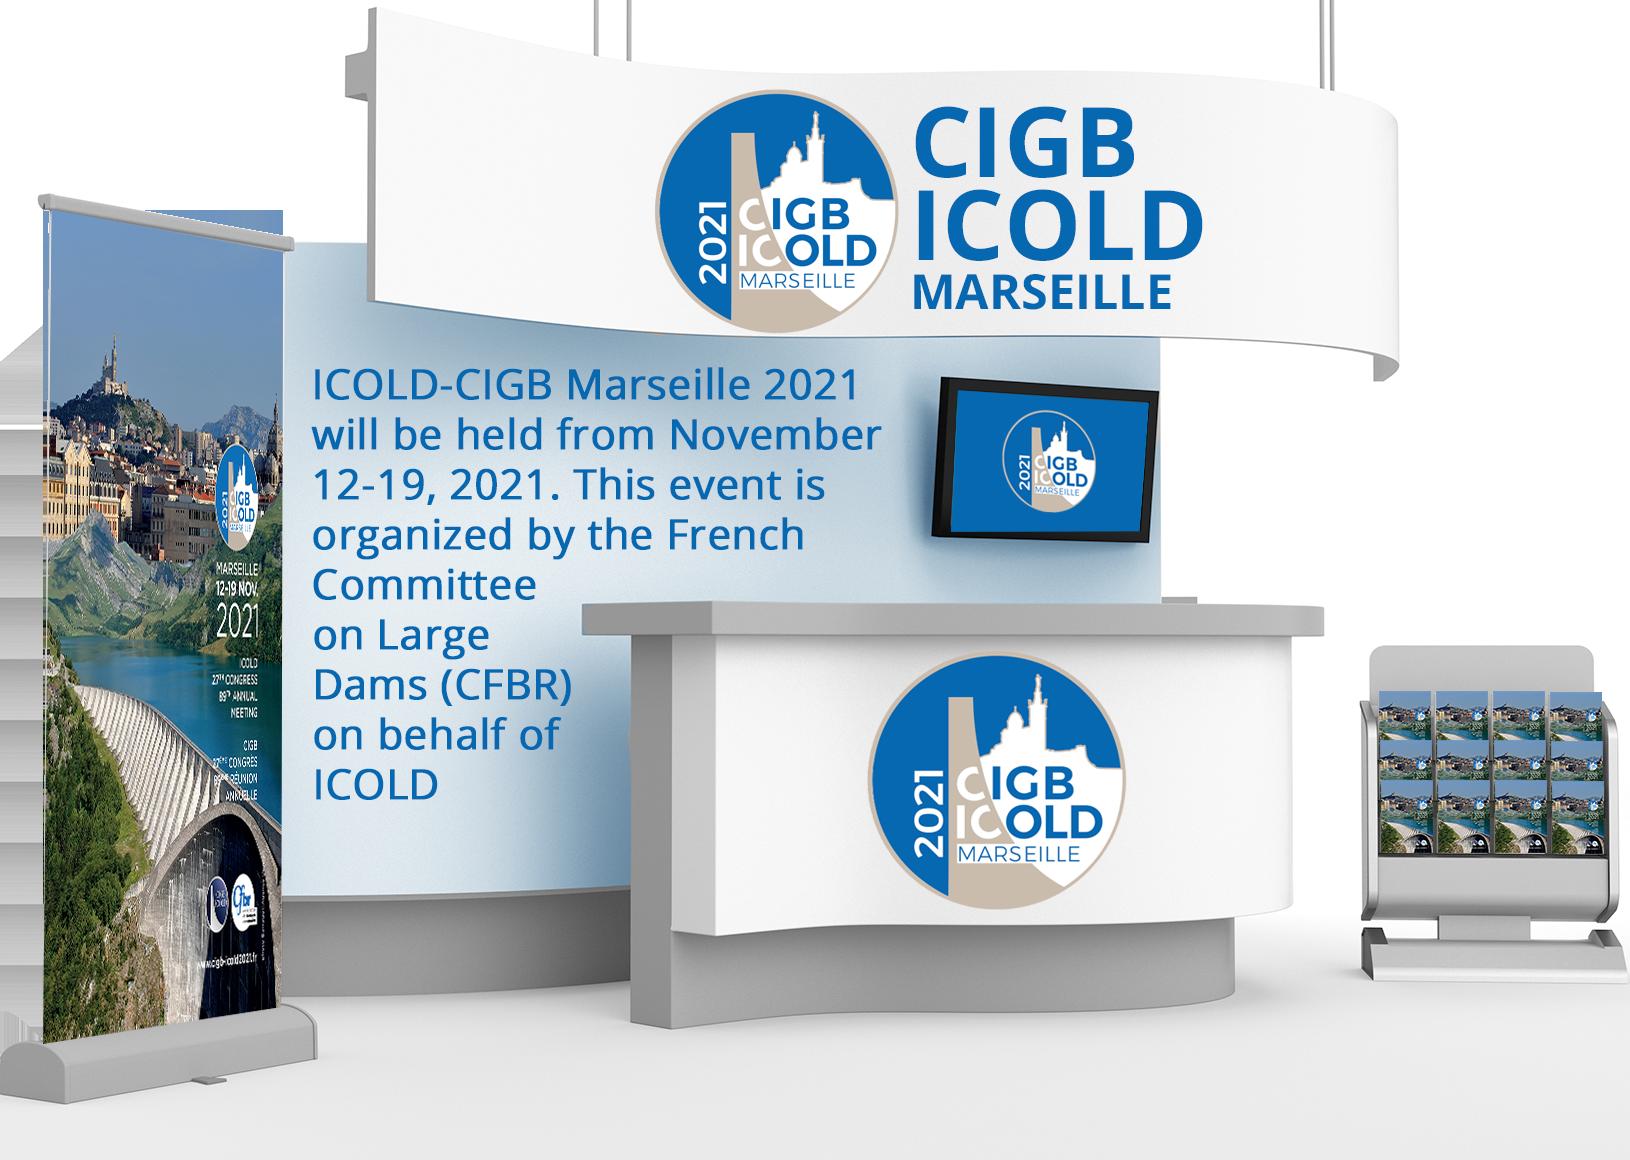 ICOLD-CIGB Marseille 2021